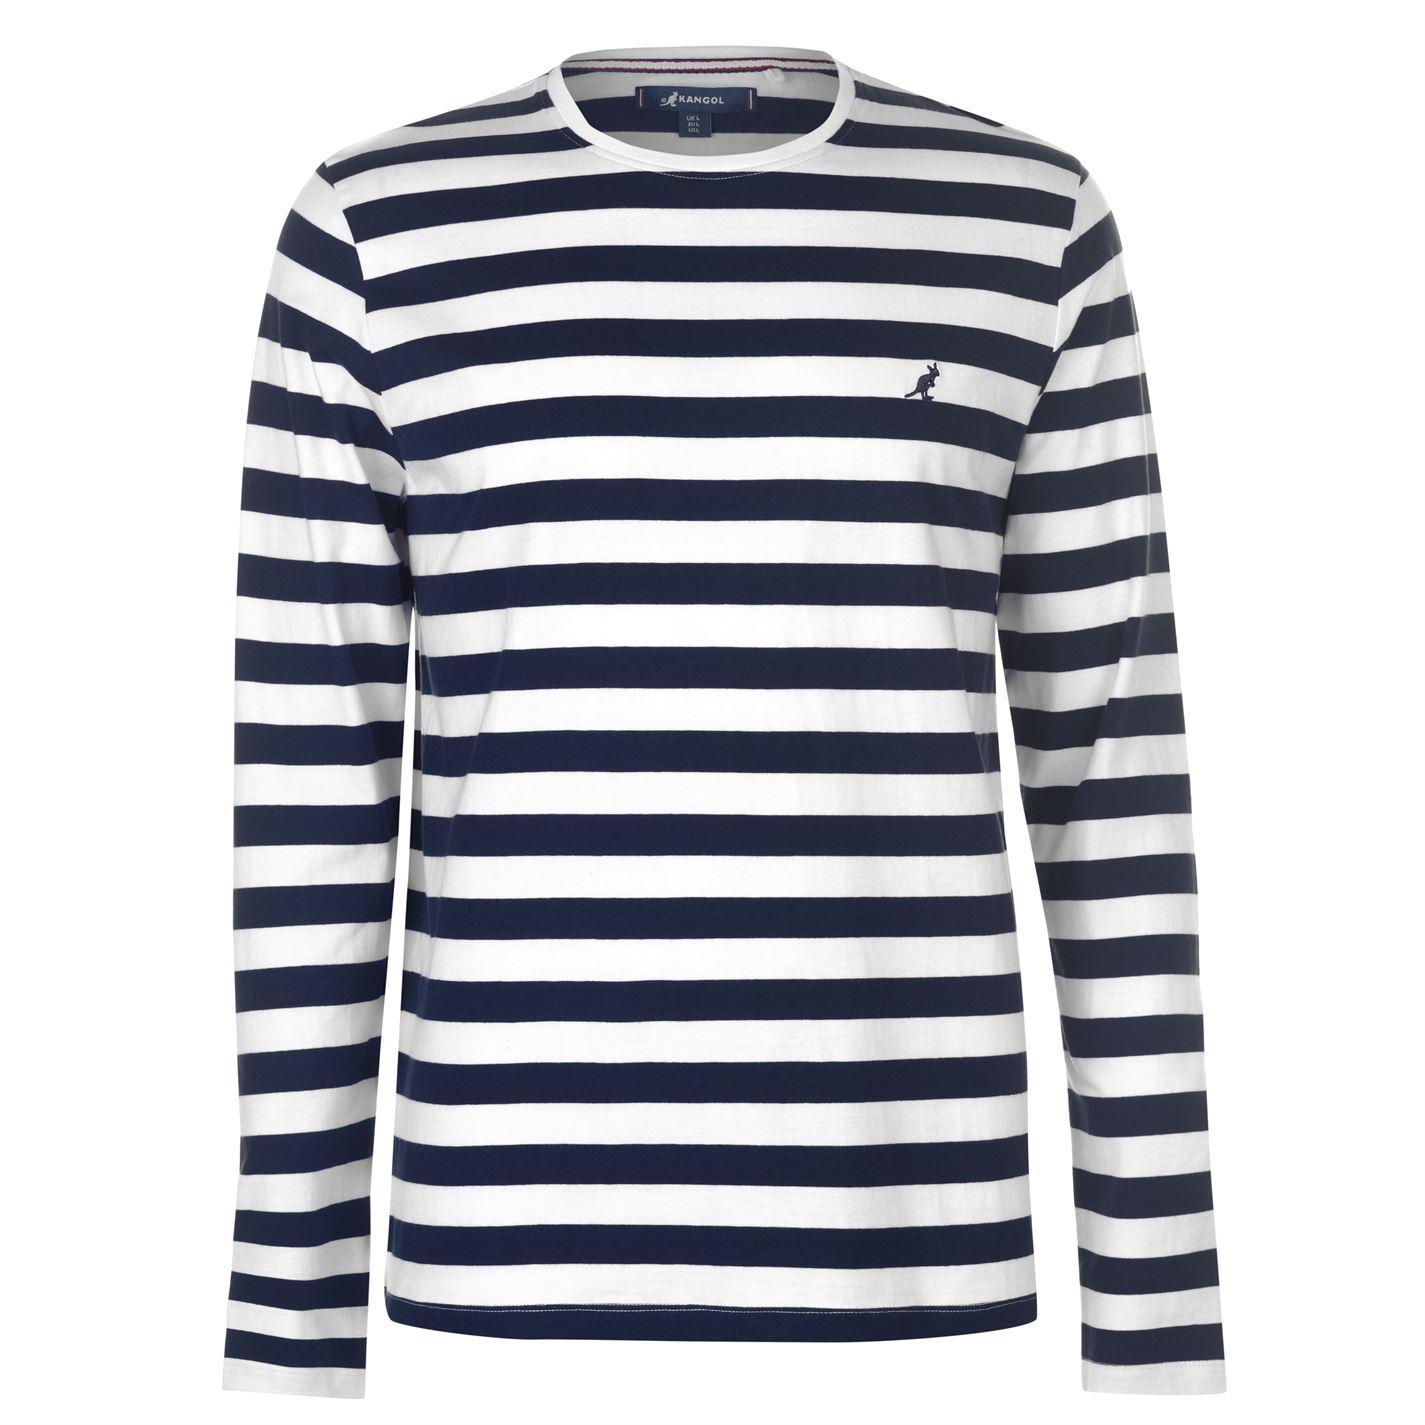 Kangol-Long-Sleeve-T-Shirt-Mens-Tee-Shirt-Top thumbnail 9